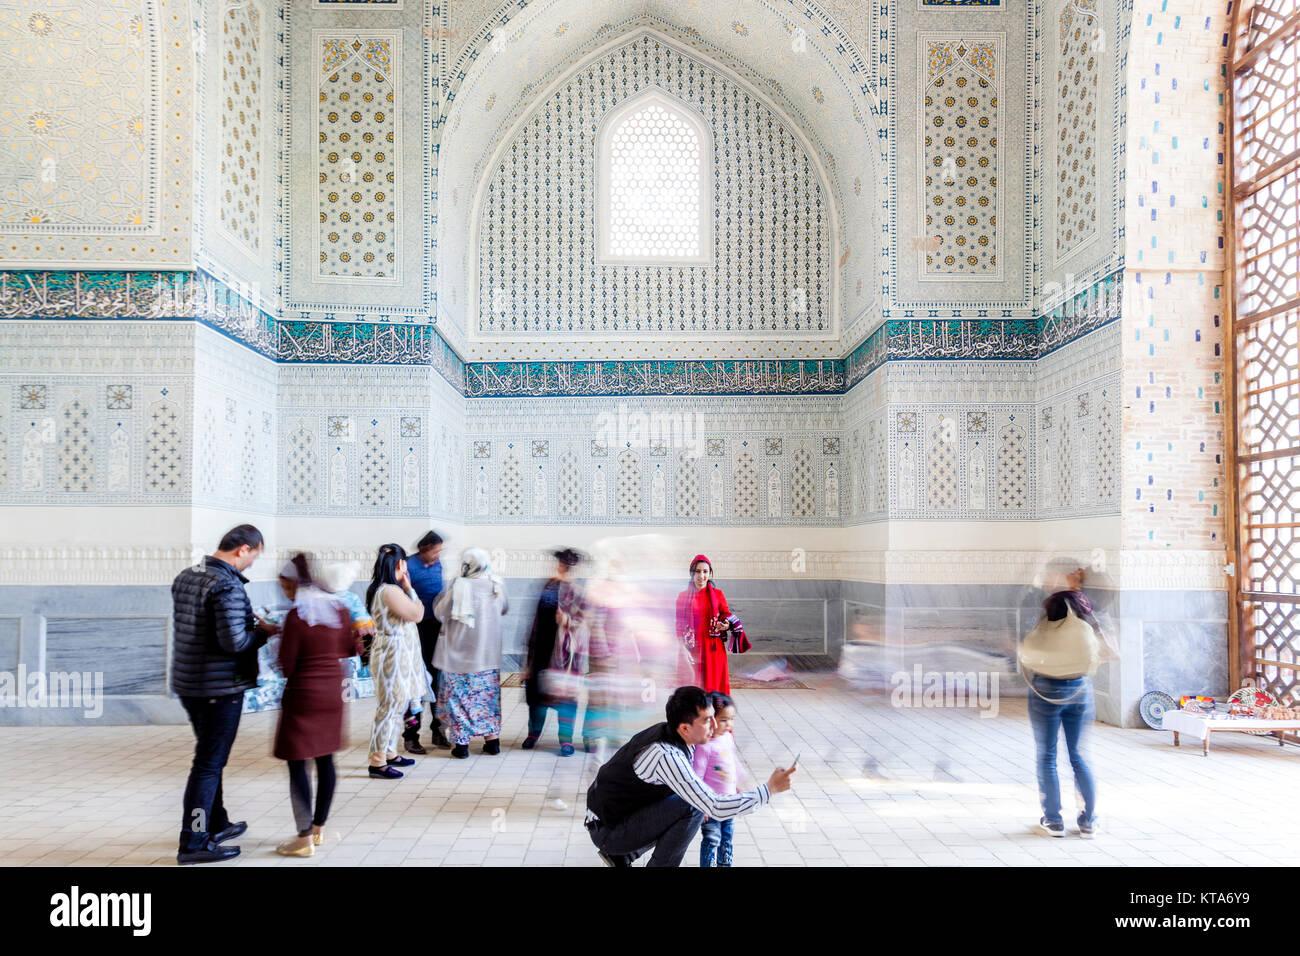 Uzbek Visitors At The Bibi Khanym Mosque, Samarkand, Uzbekistan - Stock Image